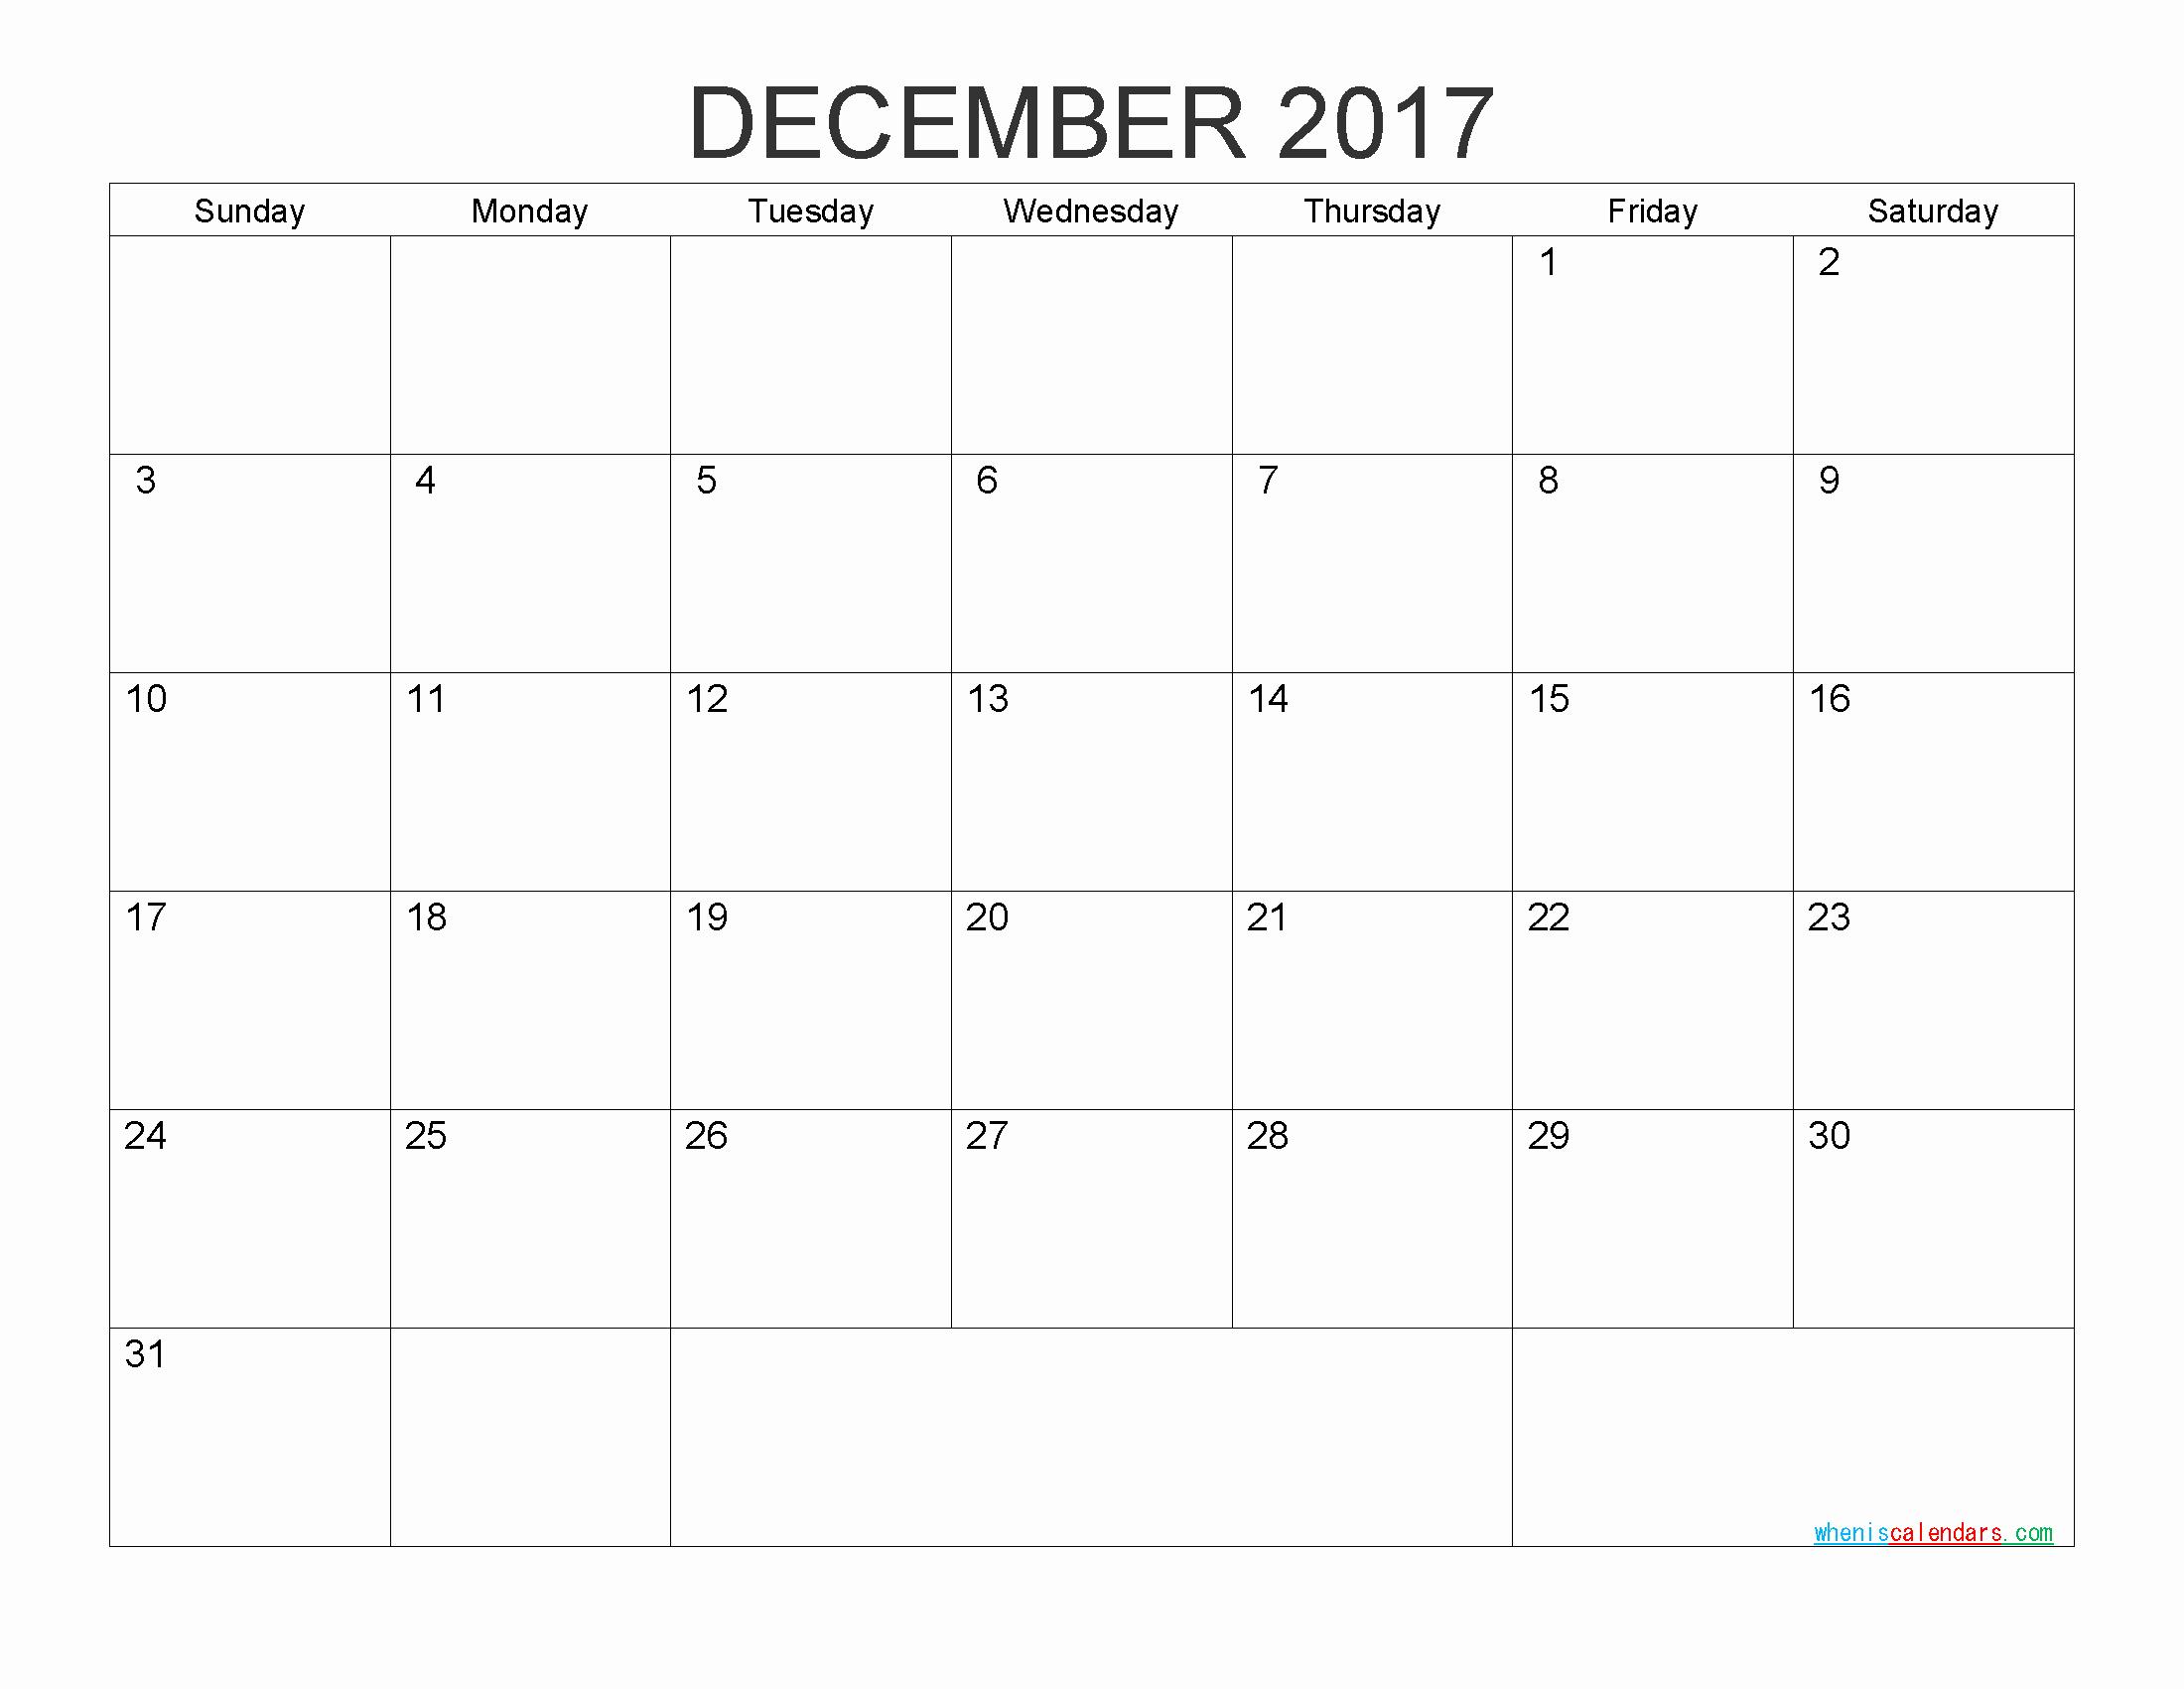 Free Printable Weekly Calendars 2017 Unique Free Printable Calendar 2017 Monthly Calendar by Pdf